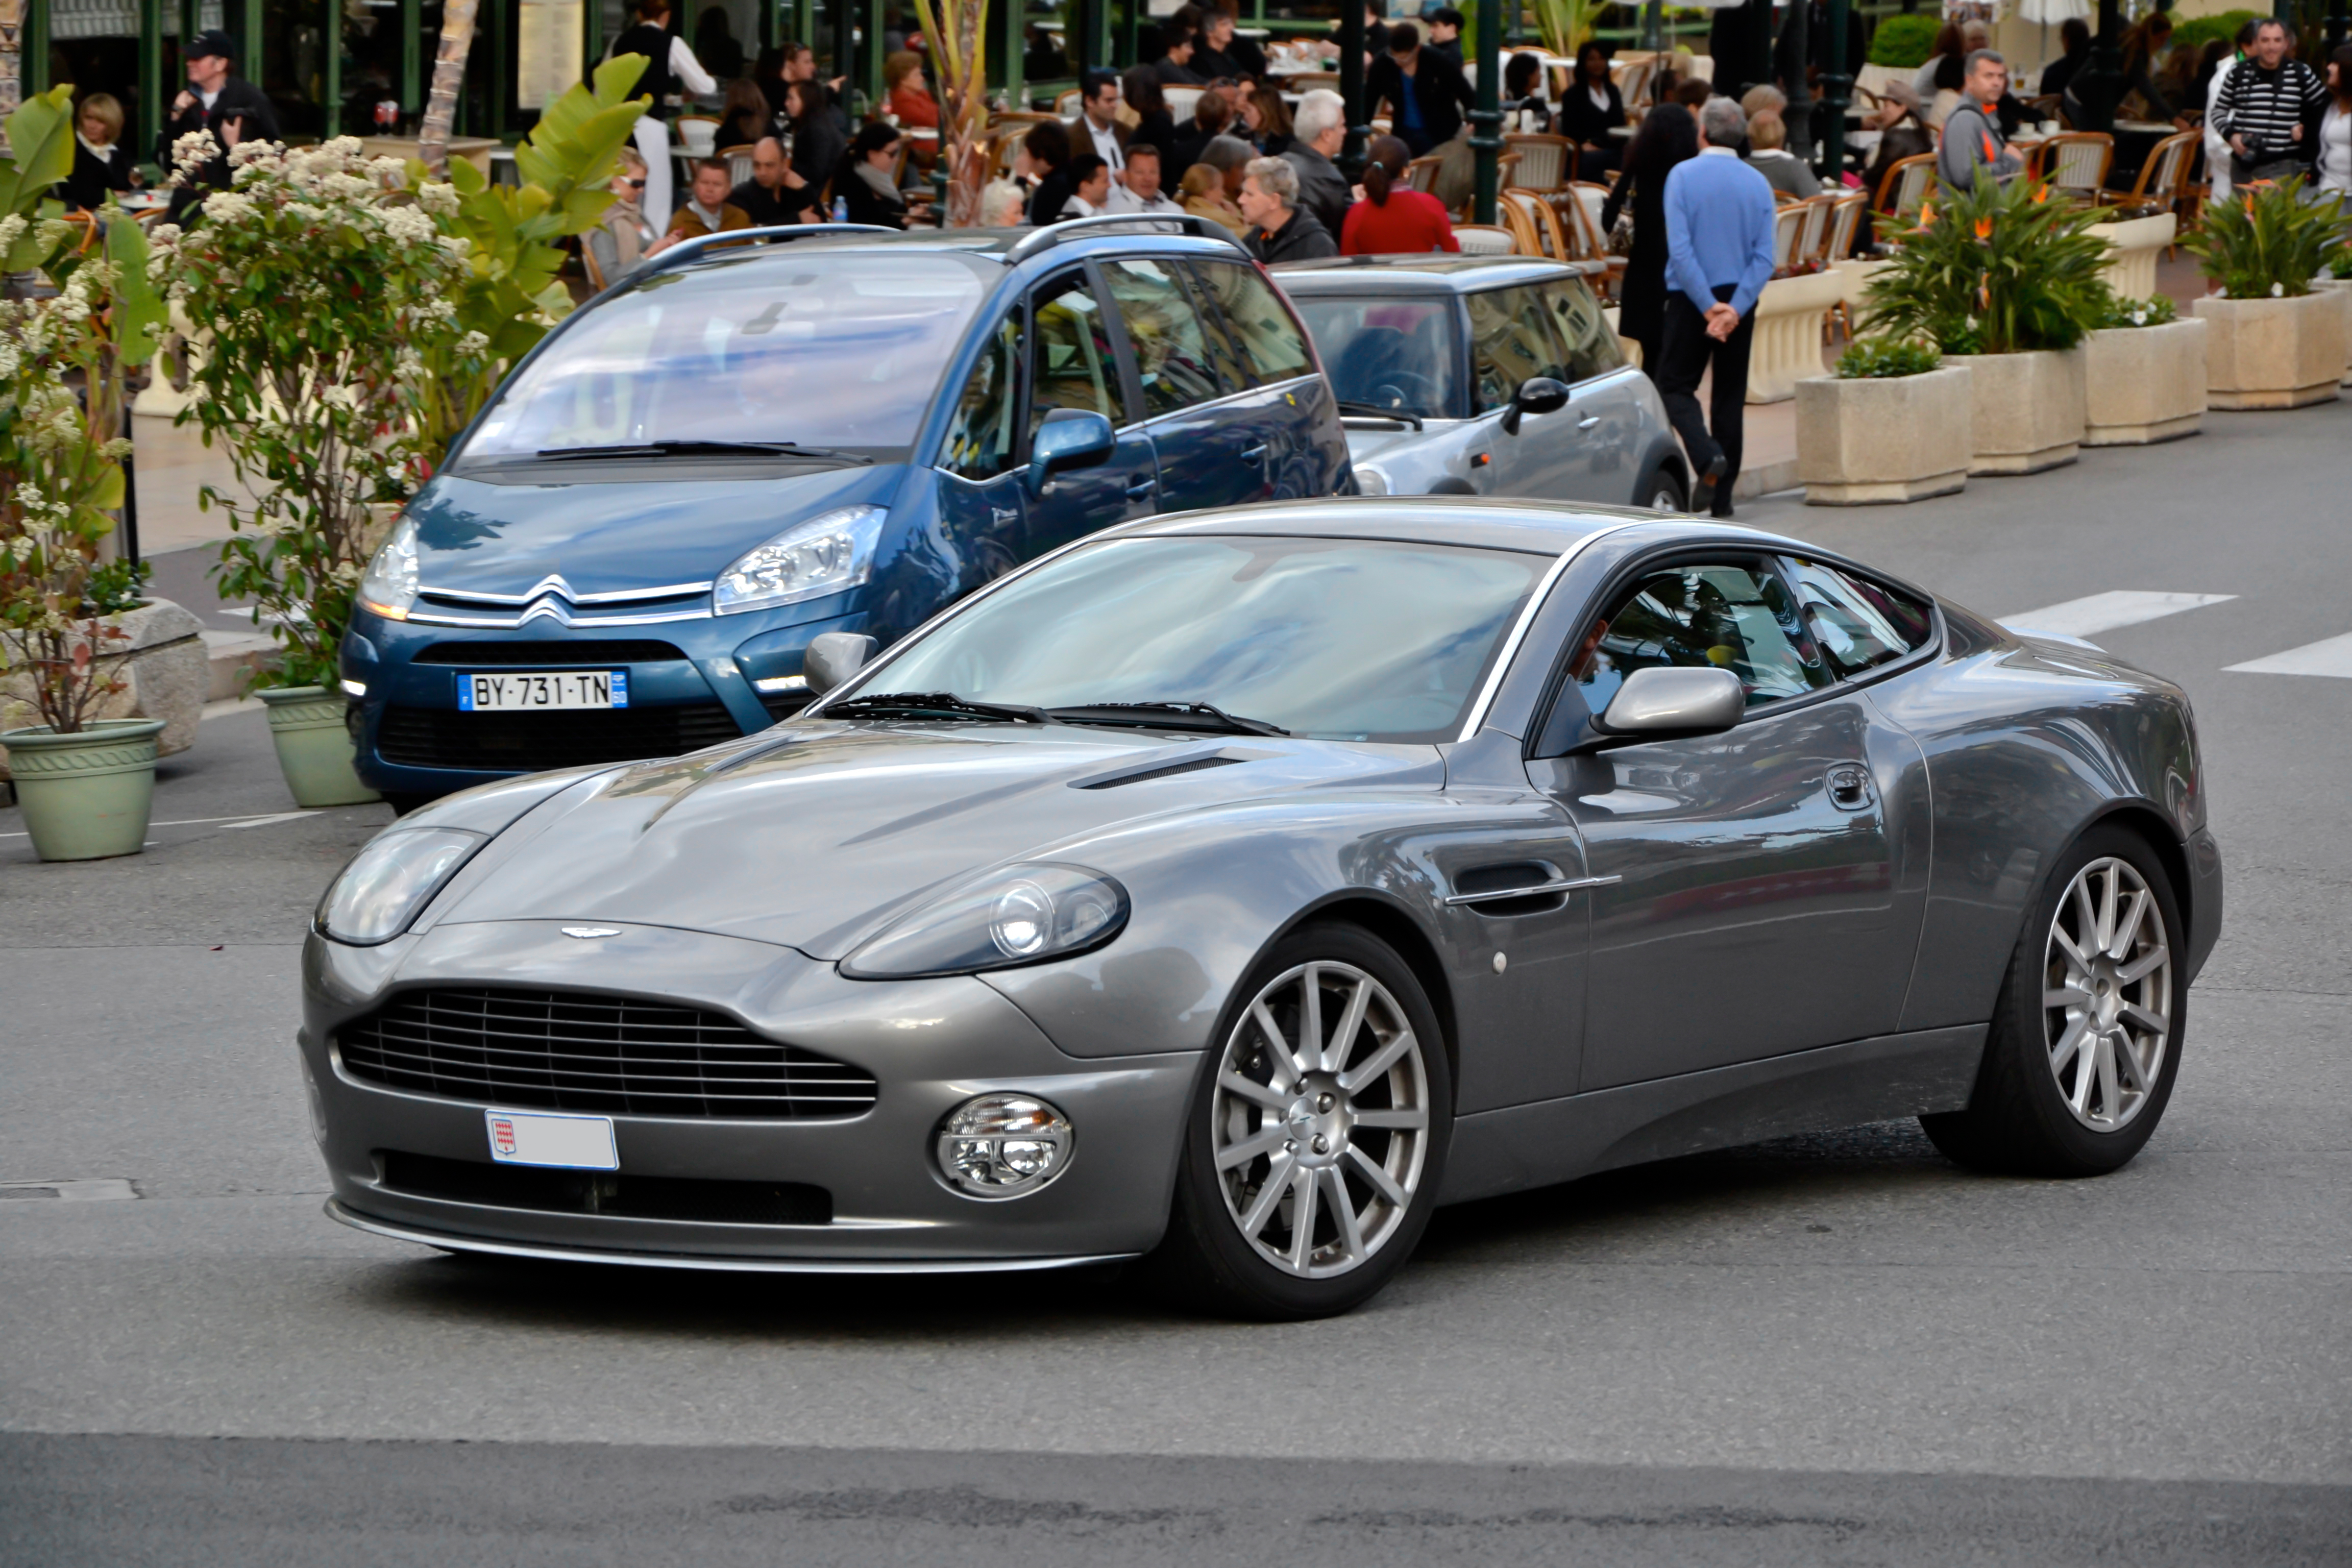 File:Aston Martin Vanquish S - Flickr - Alexandre Prévot ...